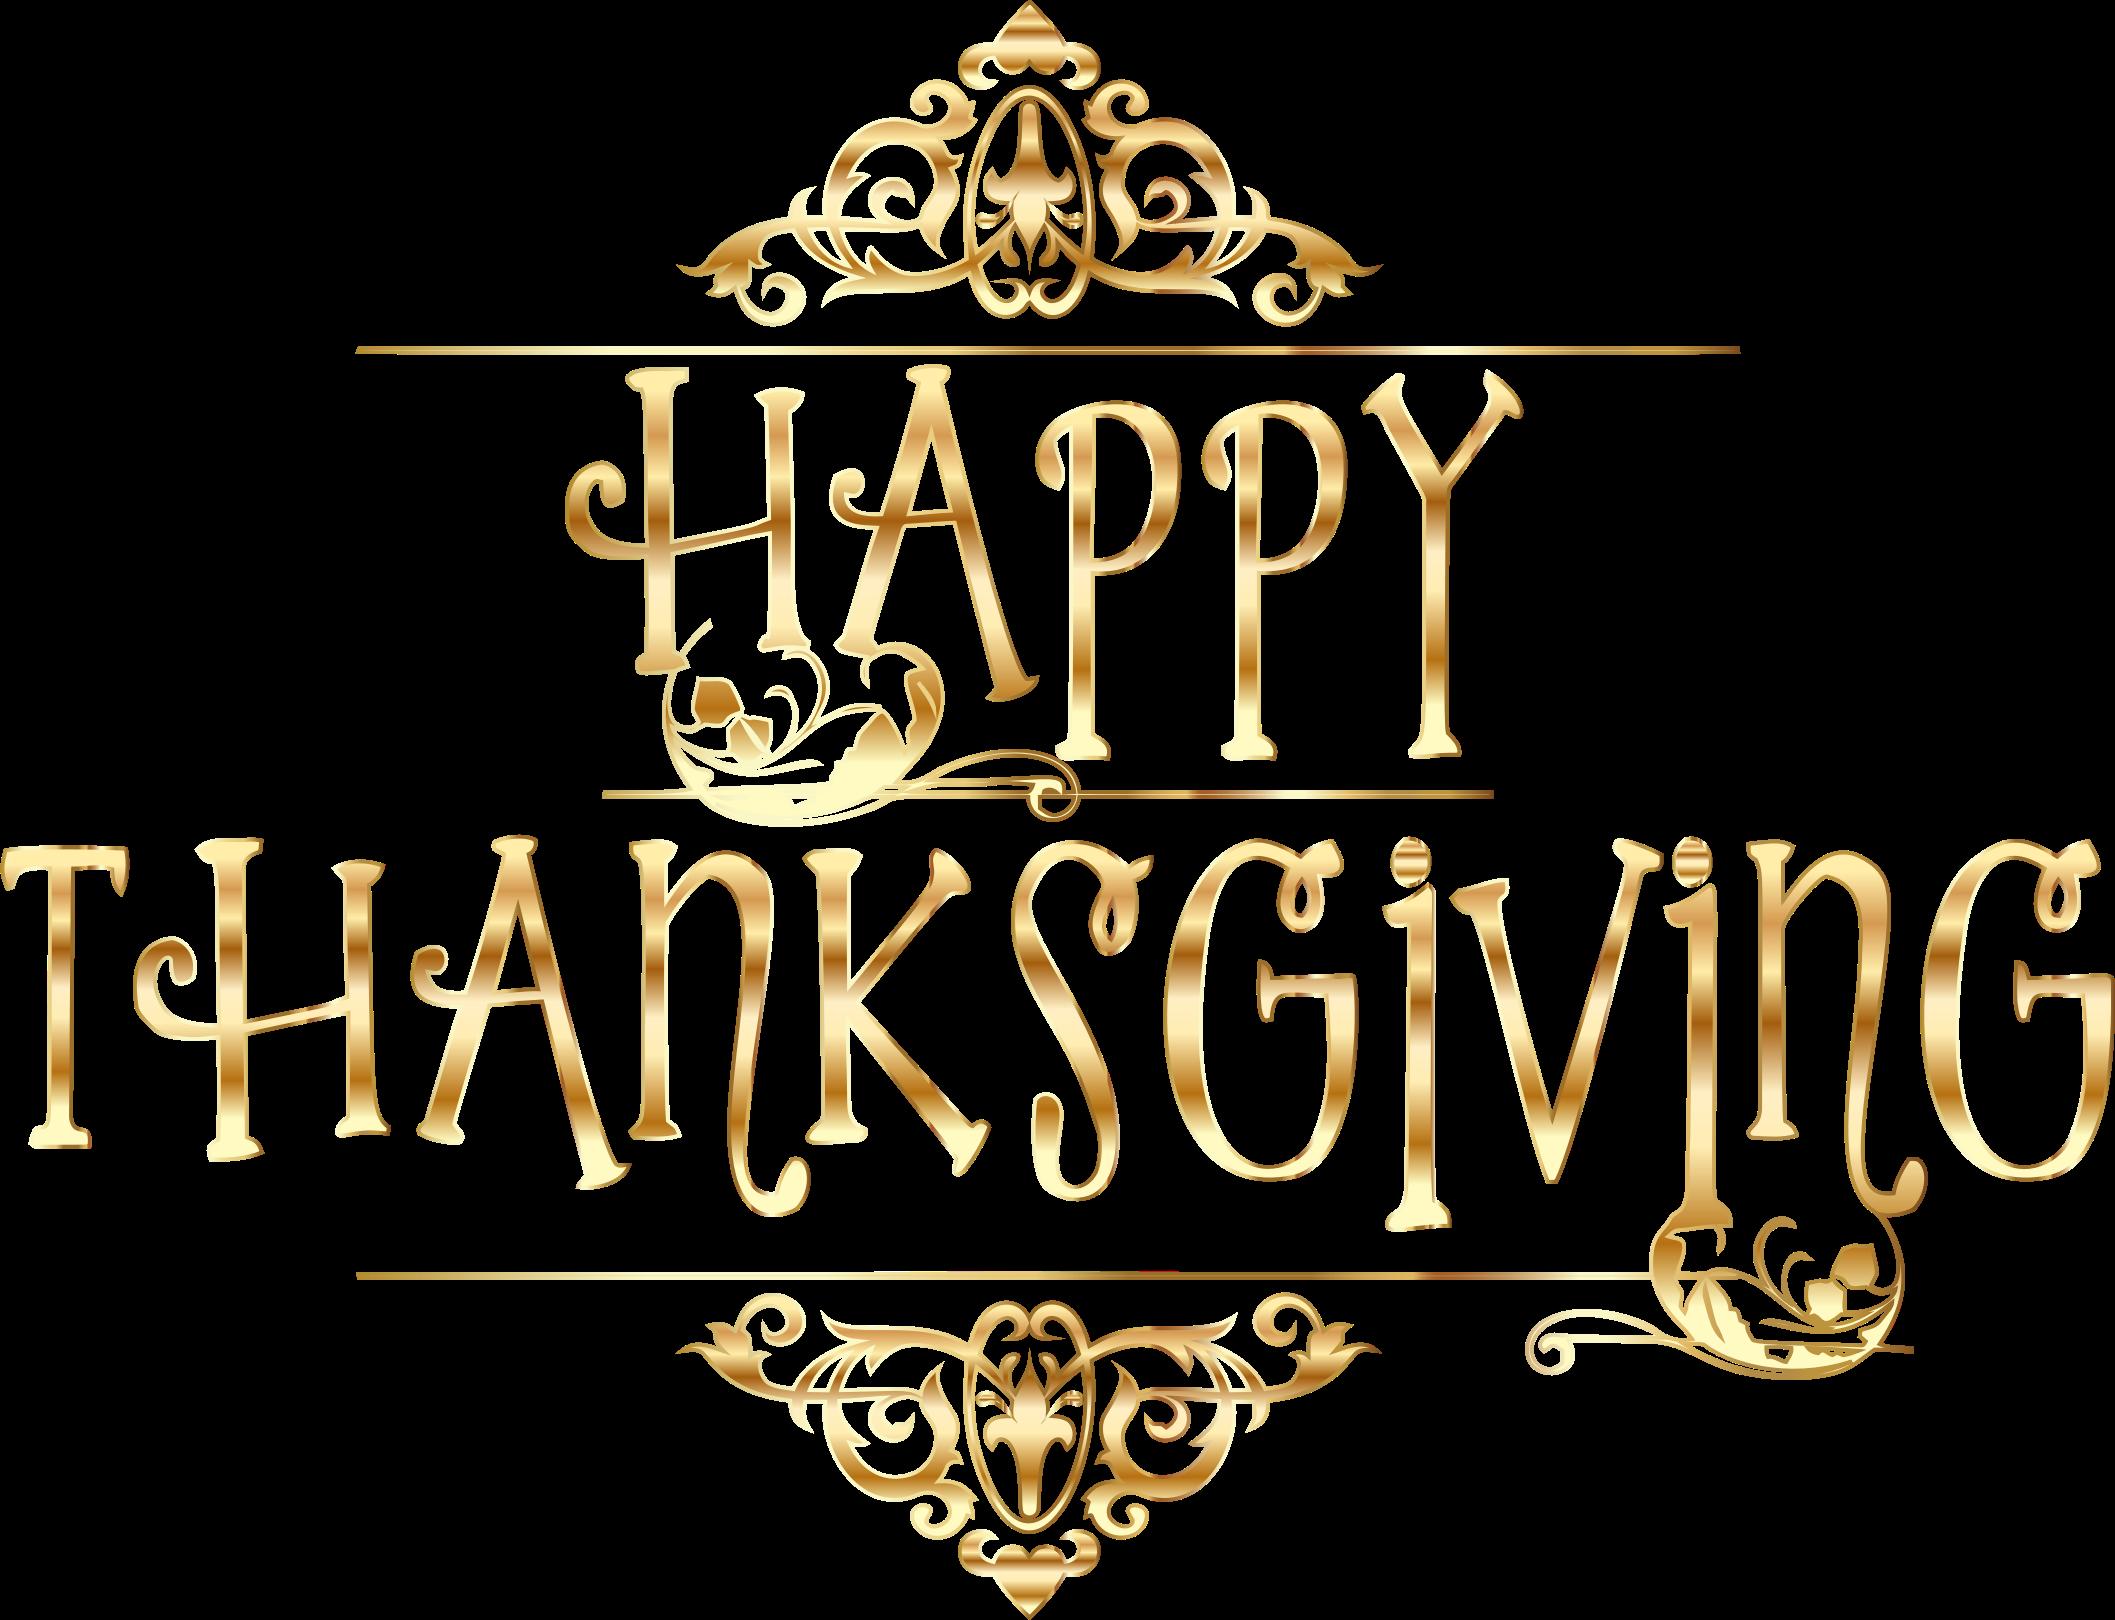 Thanksgiving Desktop Wallpaper Clip Art - Happy Thanksgiving No Background - HD Wallpaper